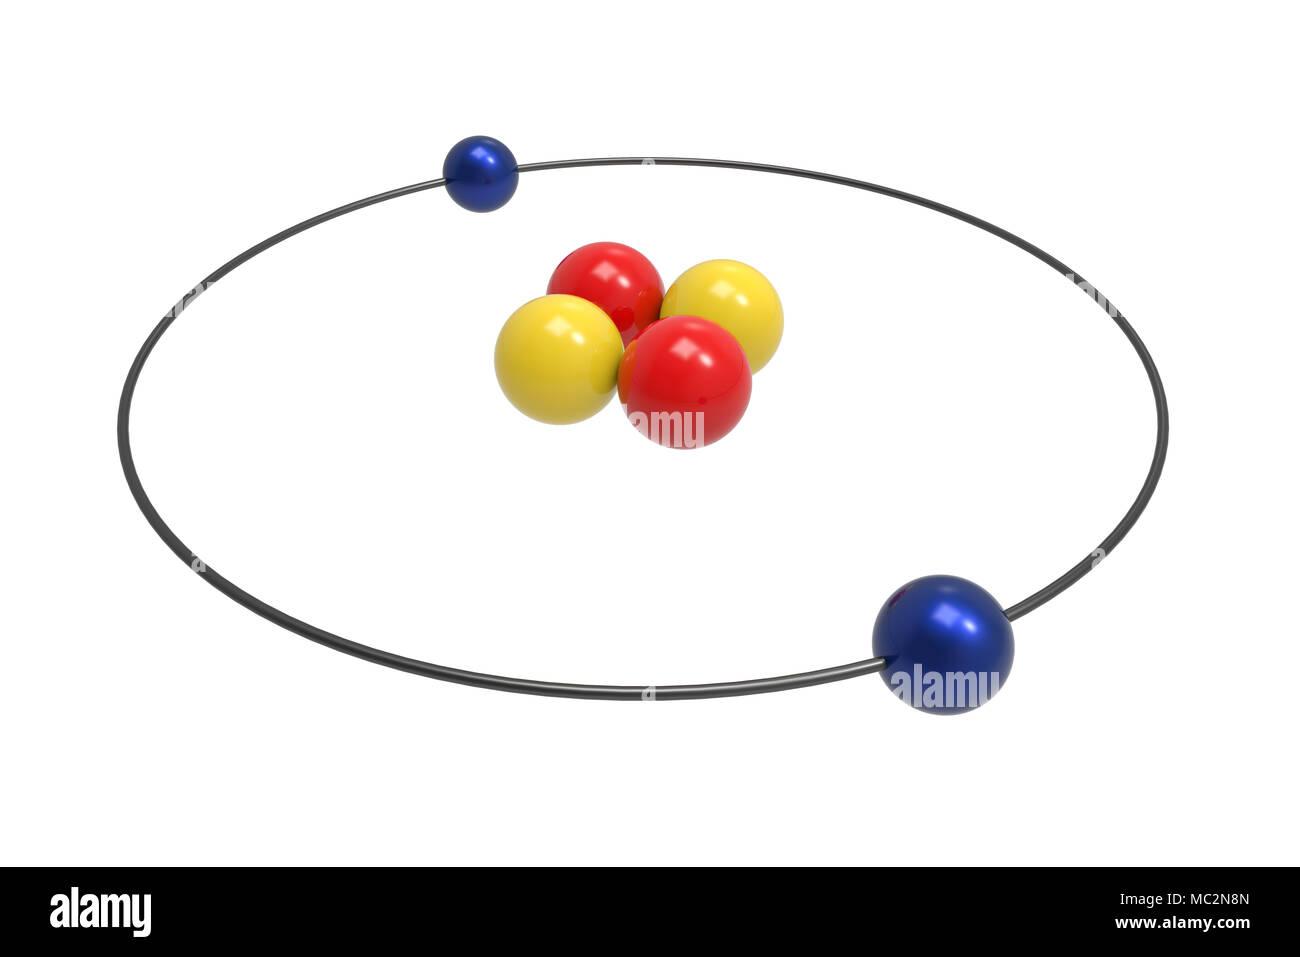 Bohr Model Of Helium Atom With Proton Neutron And